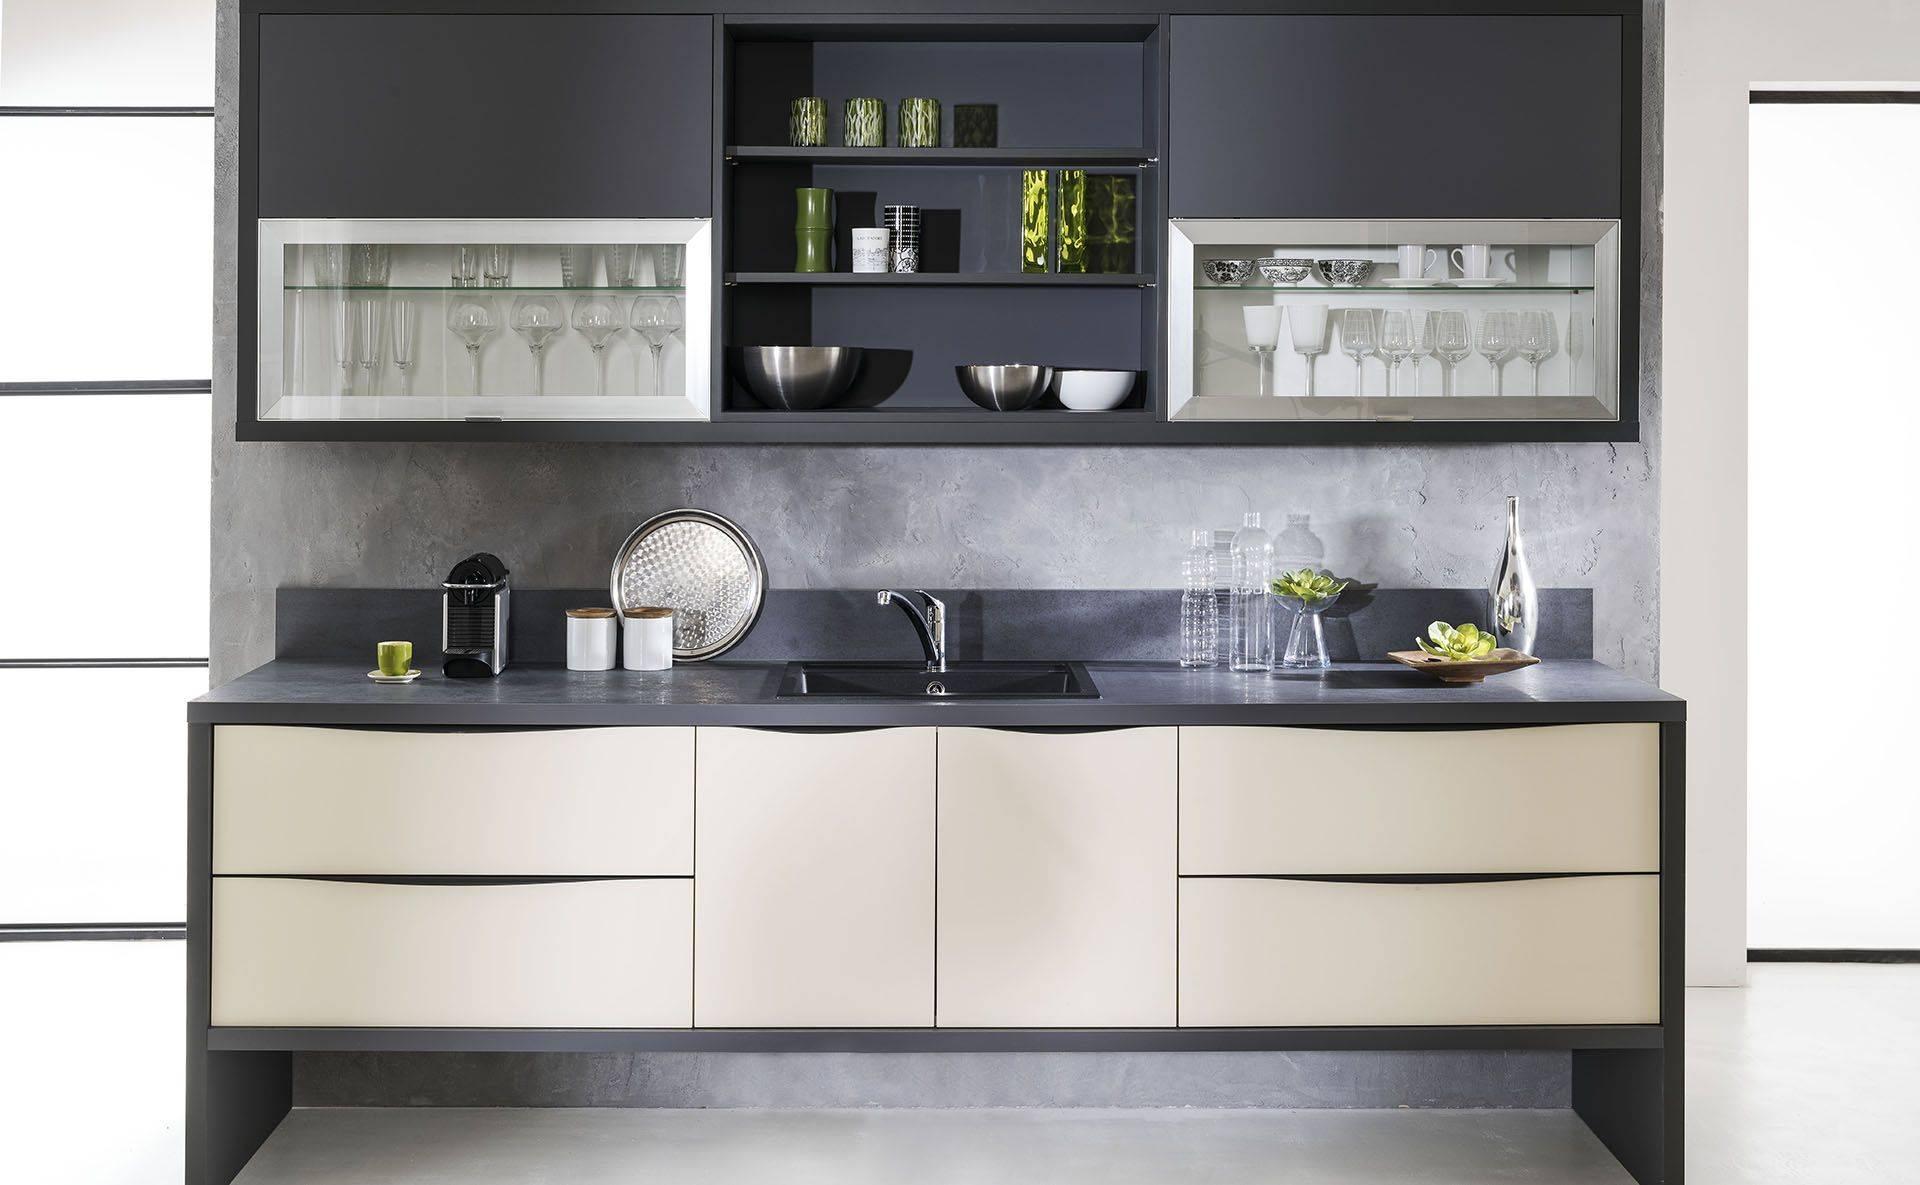 bloc evier cuisine free bloc cuisine castorama cuisine complate all in basic gris meuble evier. Black Bedroom Furniture Sets. Home Design Ideas